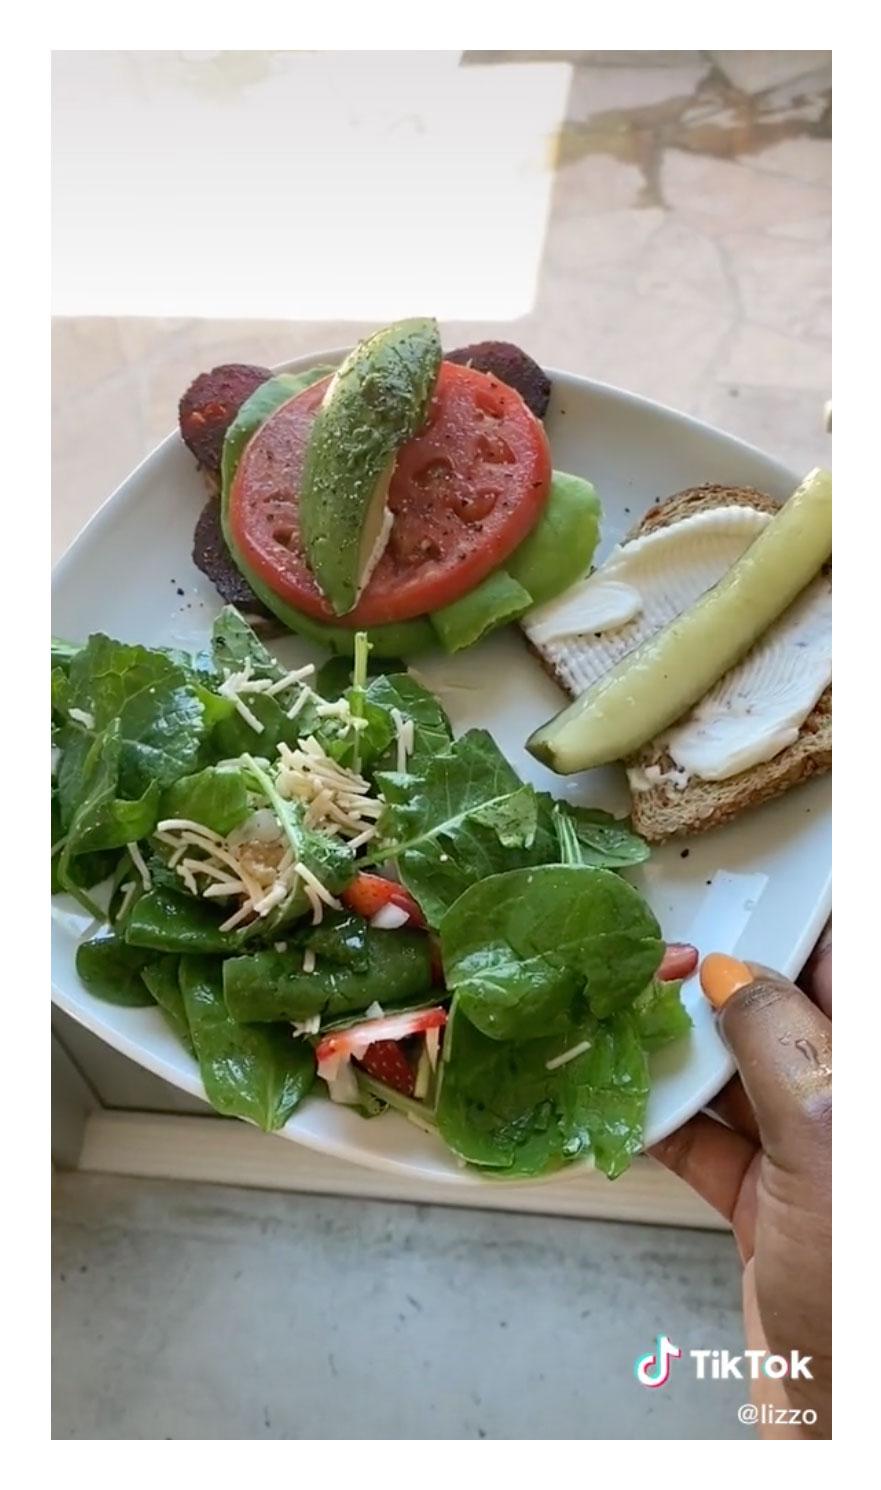 Vegan BLT Sandwich Lizzo Reveals More of Her Favorite Vegan Eats TikTok